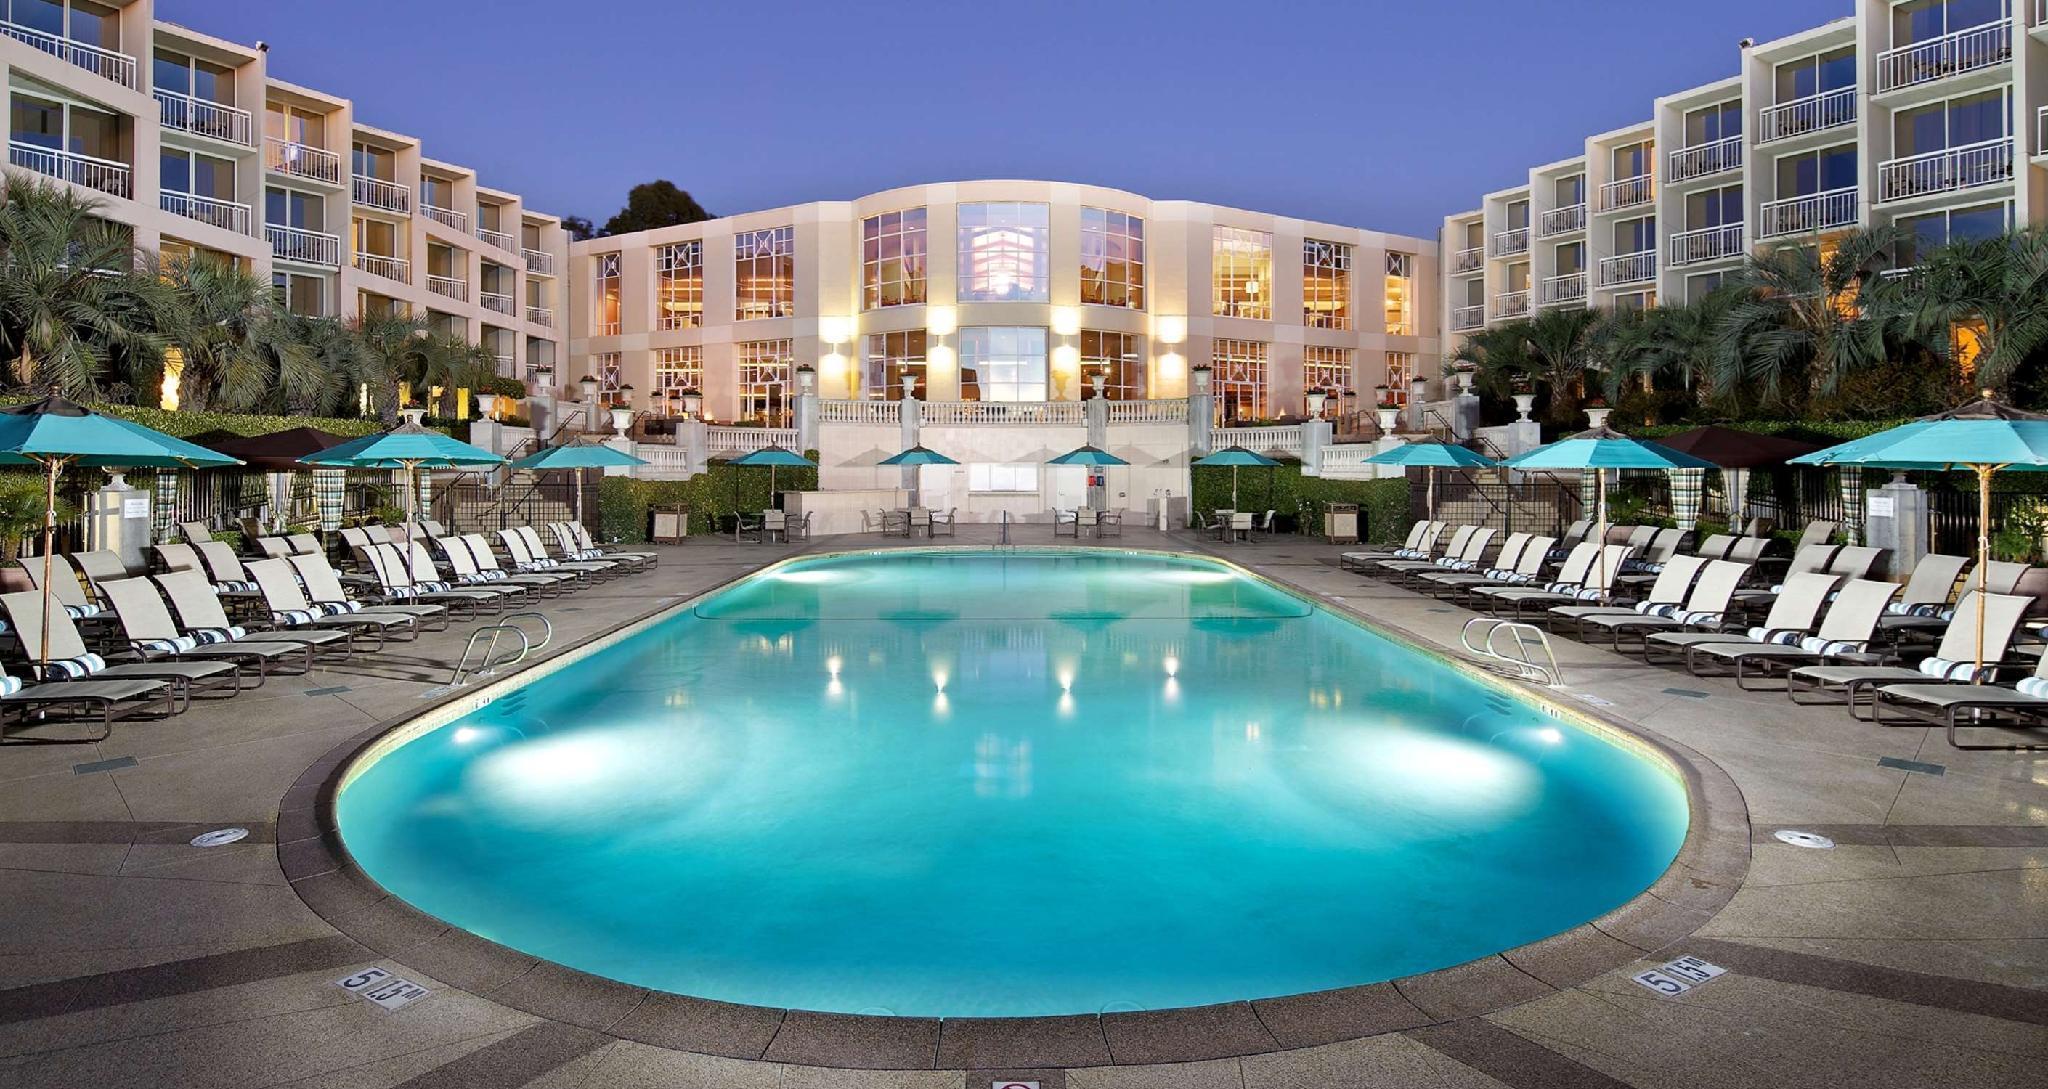 Hilton La Jolla Torrey Pines Hotel